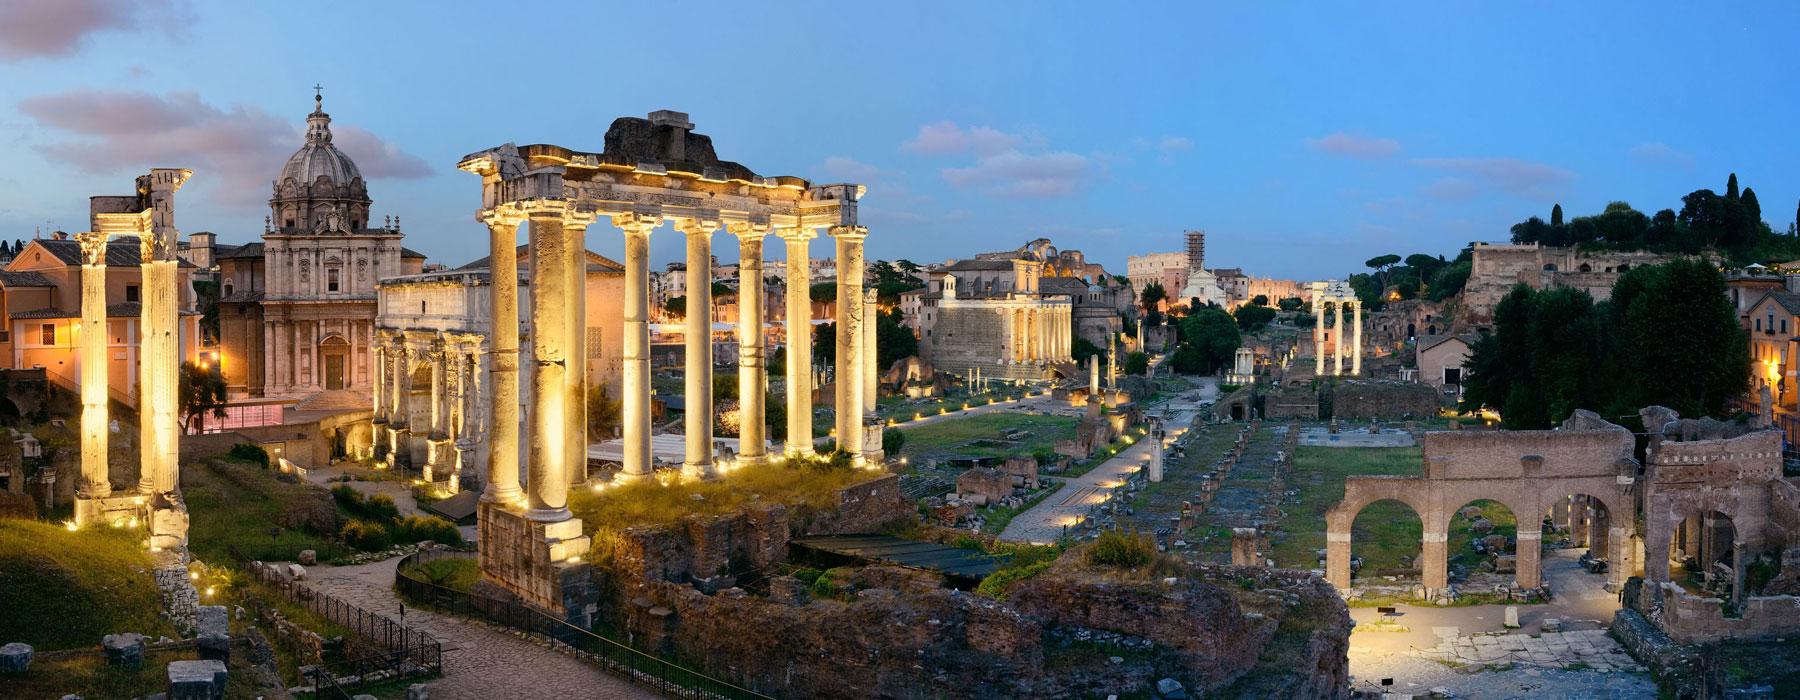 Roma_7.jpg